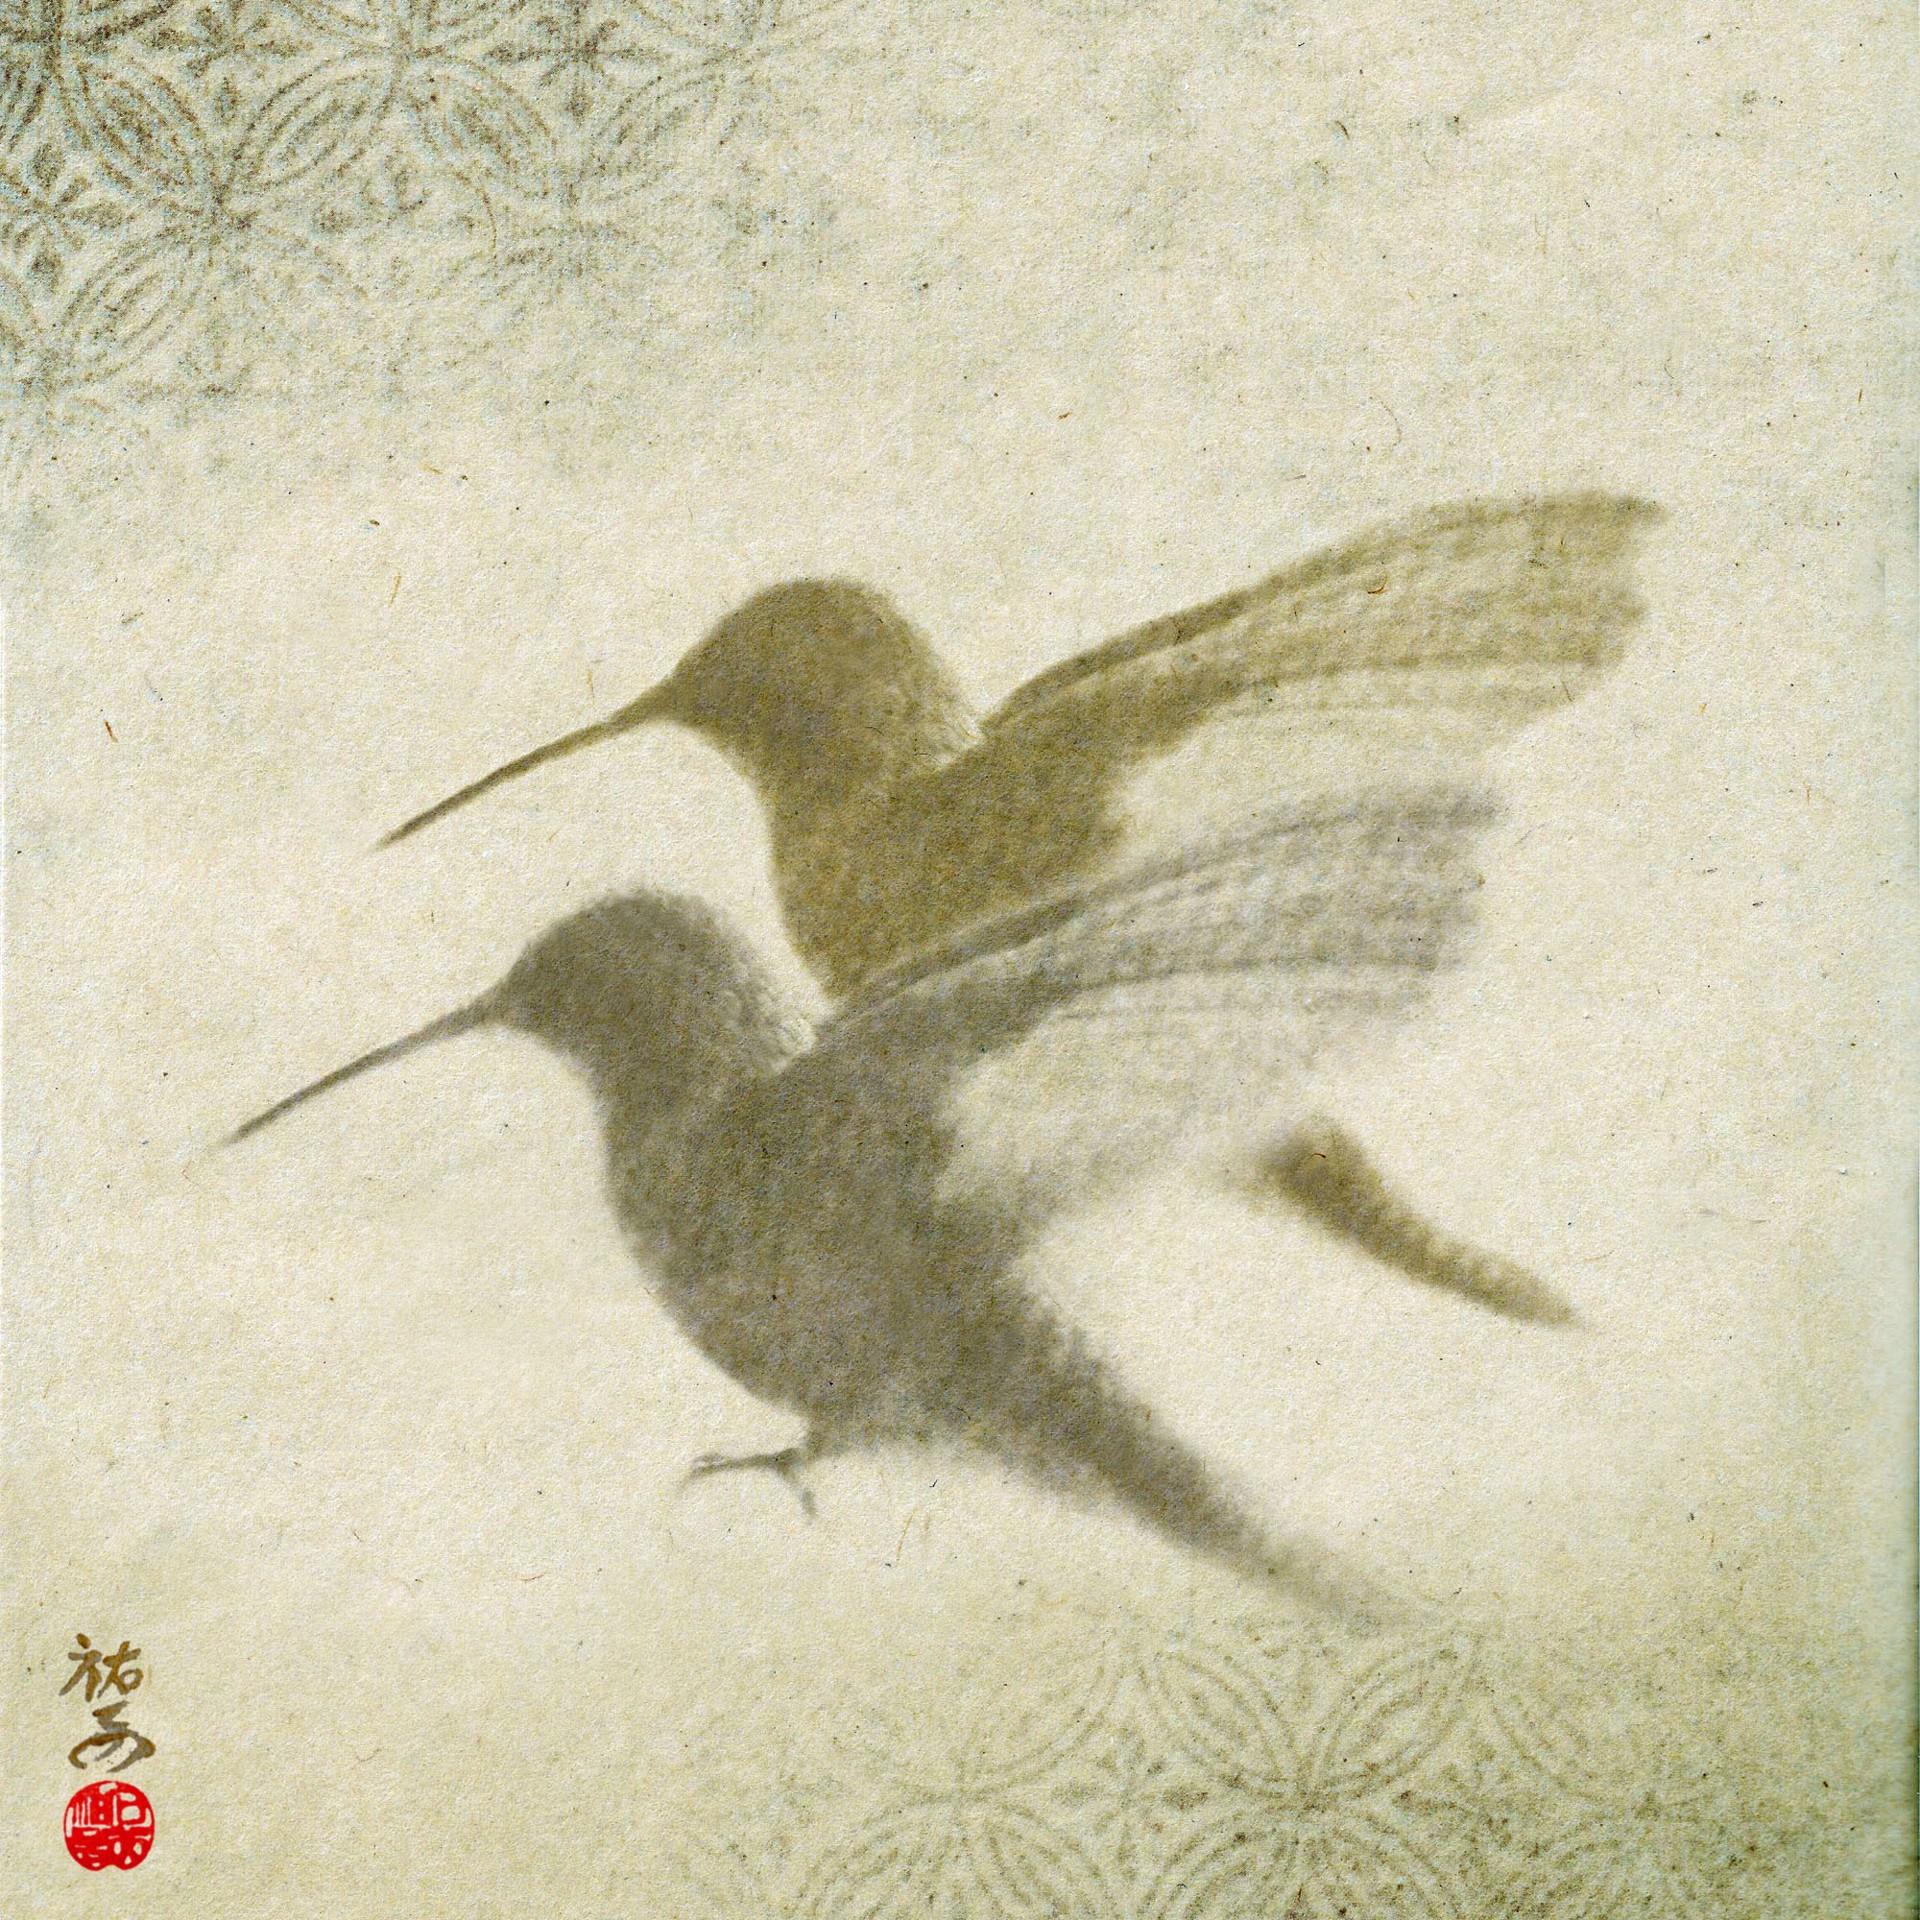 Zen Mind by Yuko Ishii